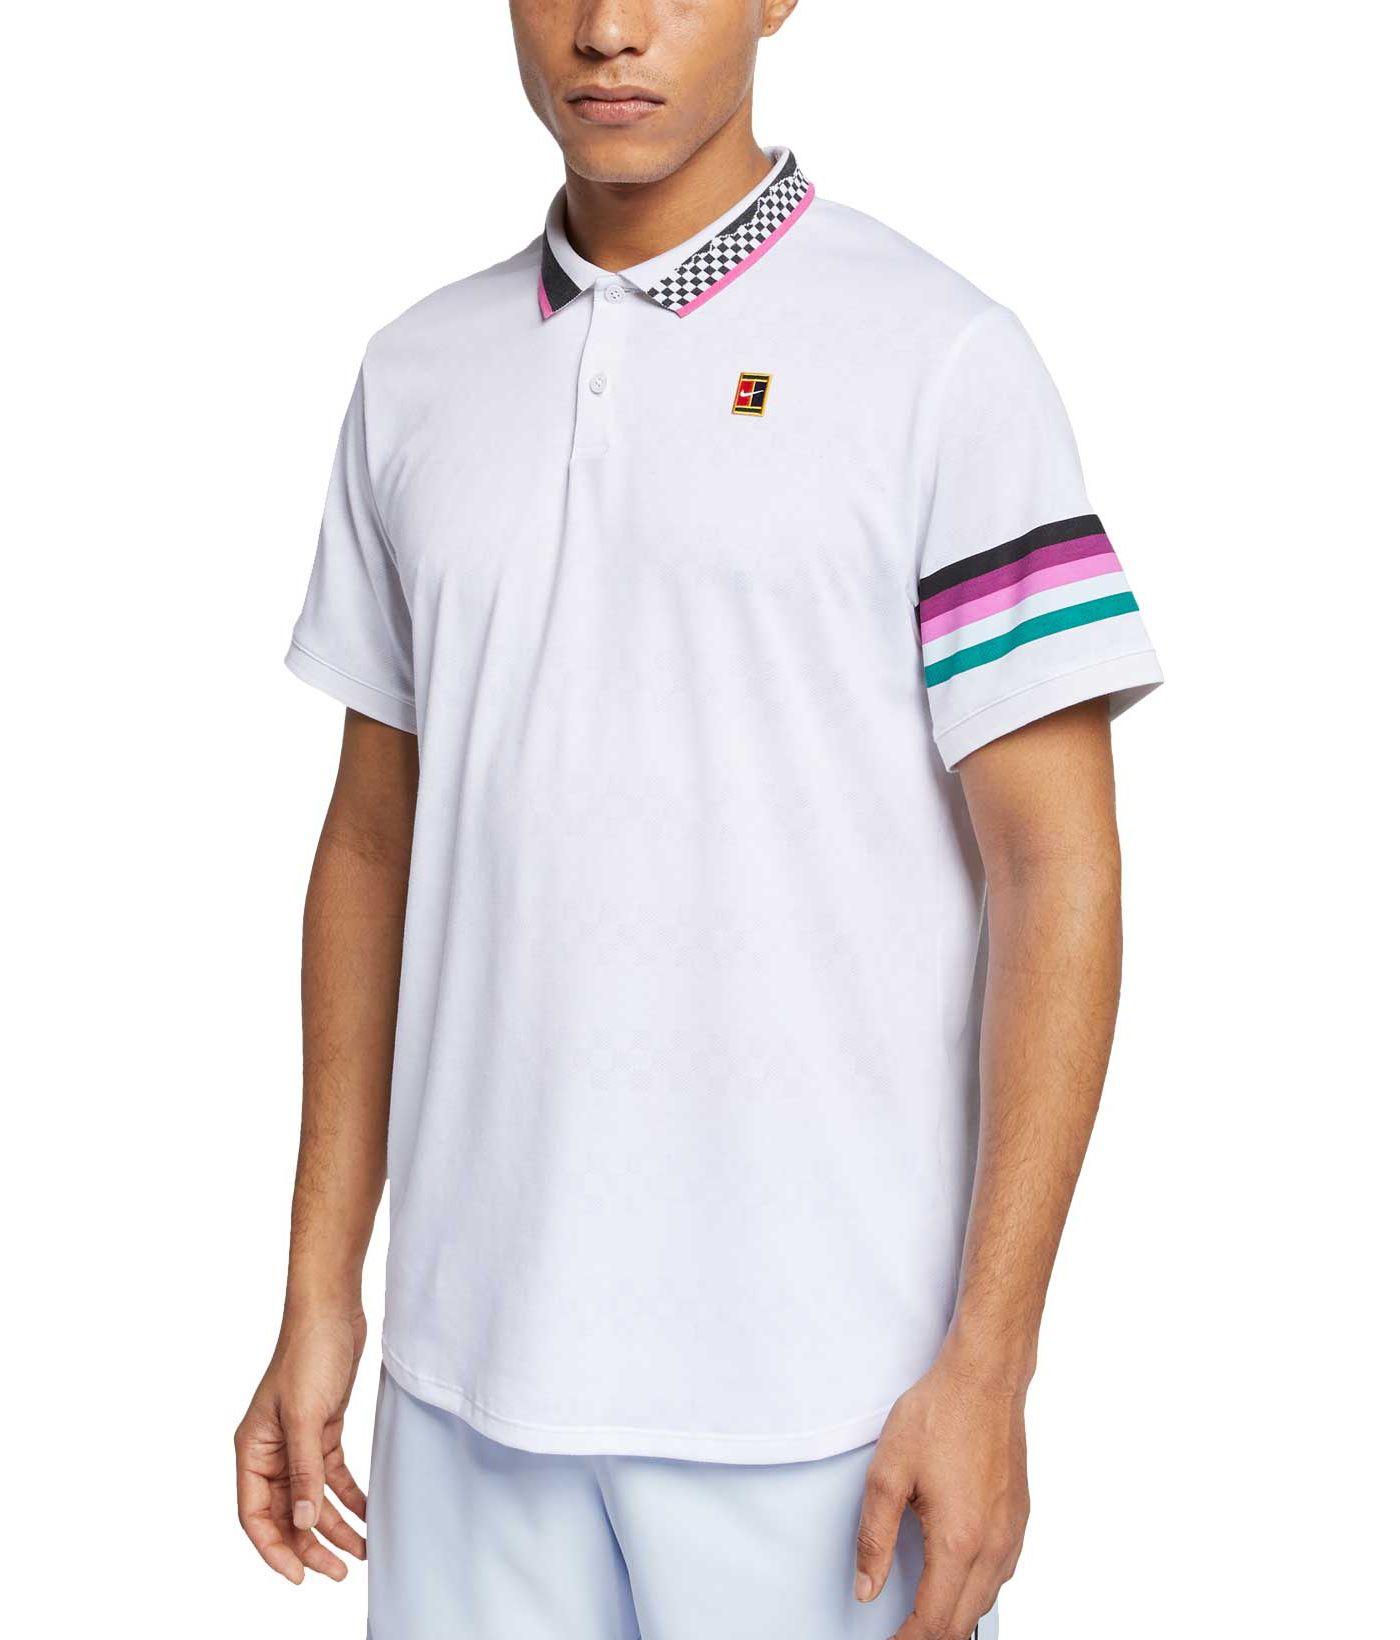 Nike Men's NikeCourt Advantage Dri-FIT Tennis Polo